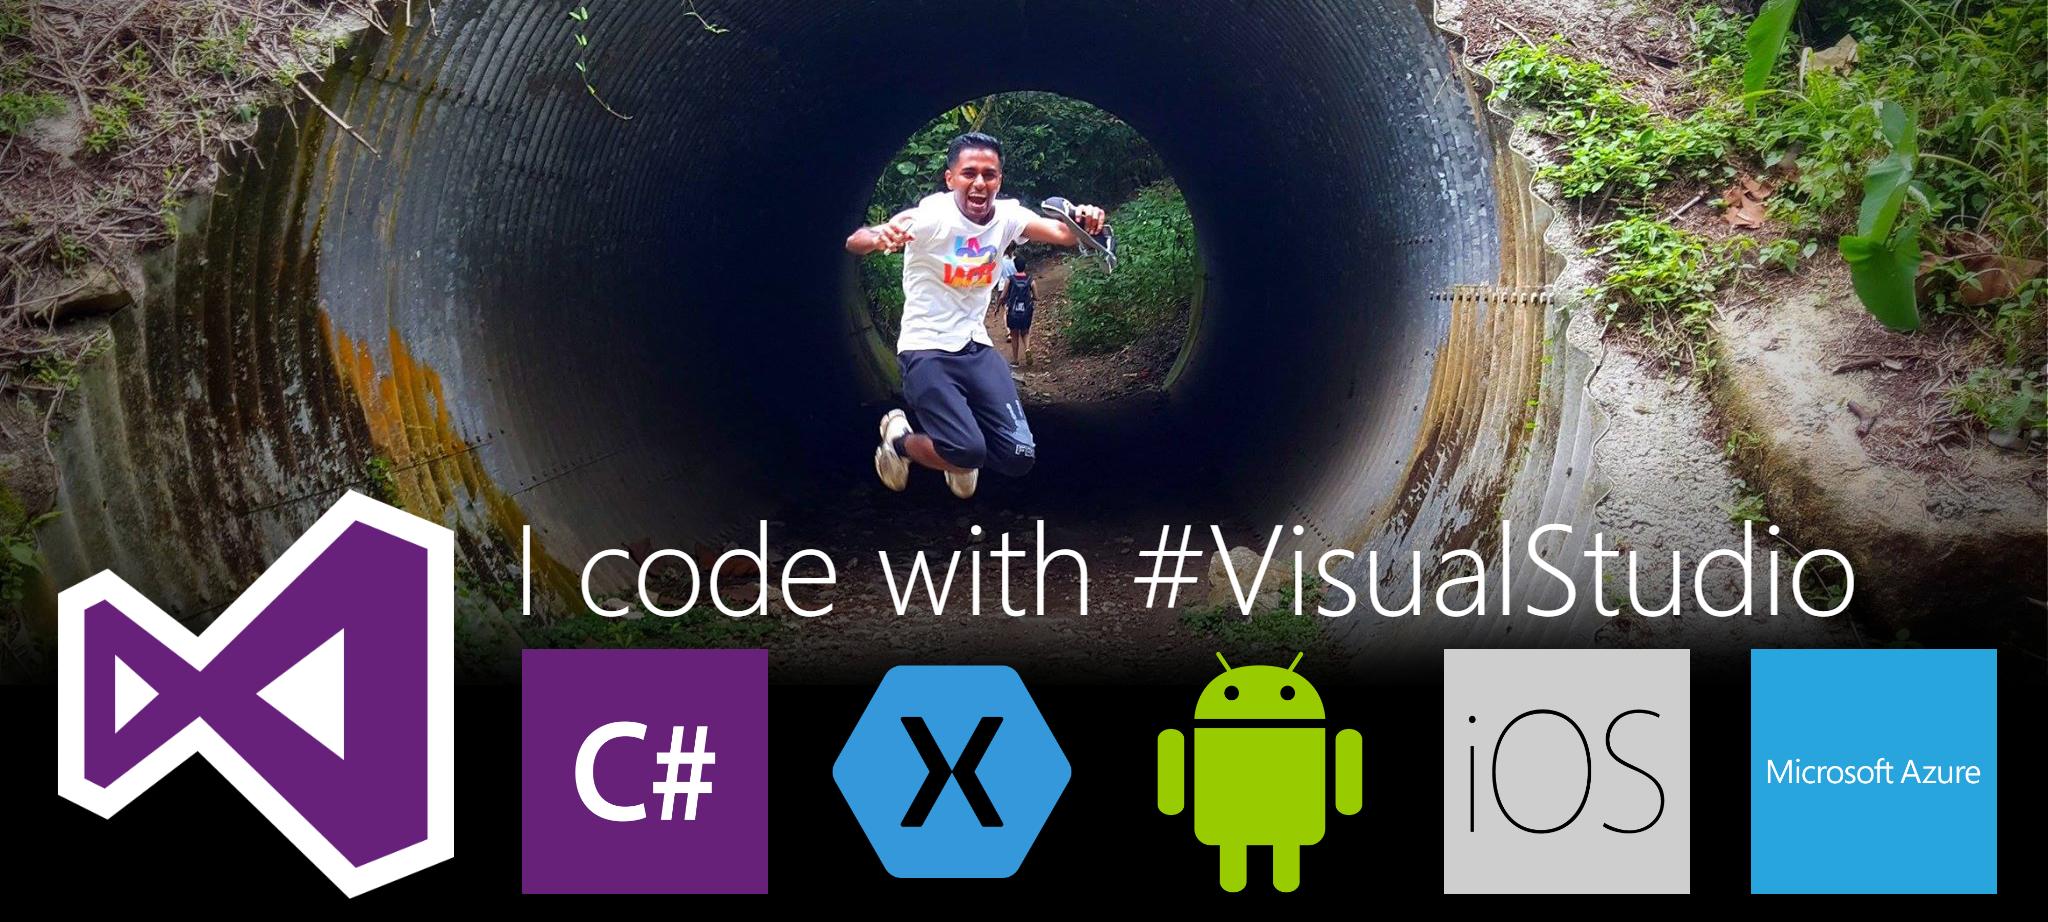 I code with Visual Studio 2